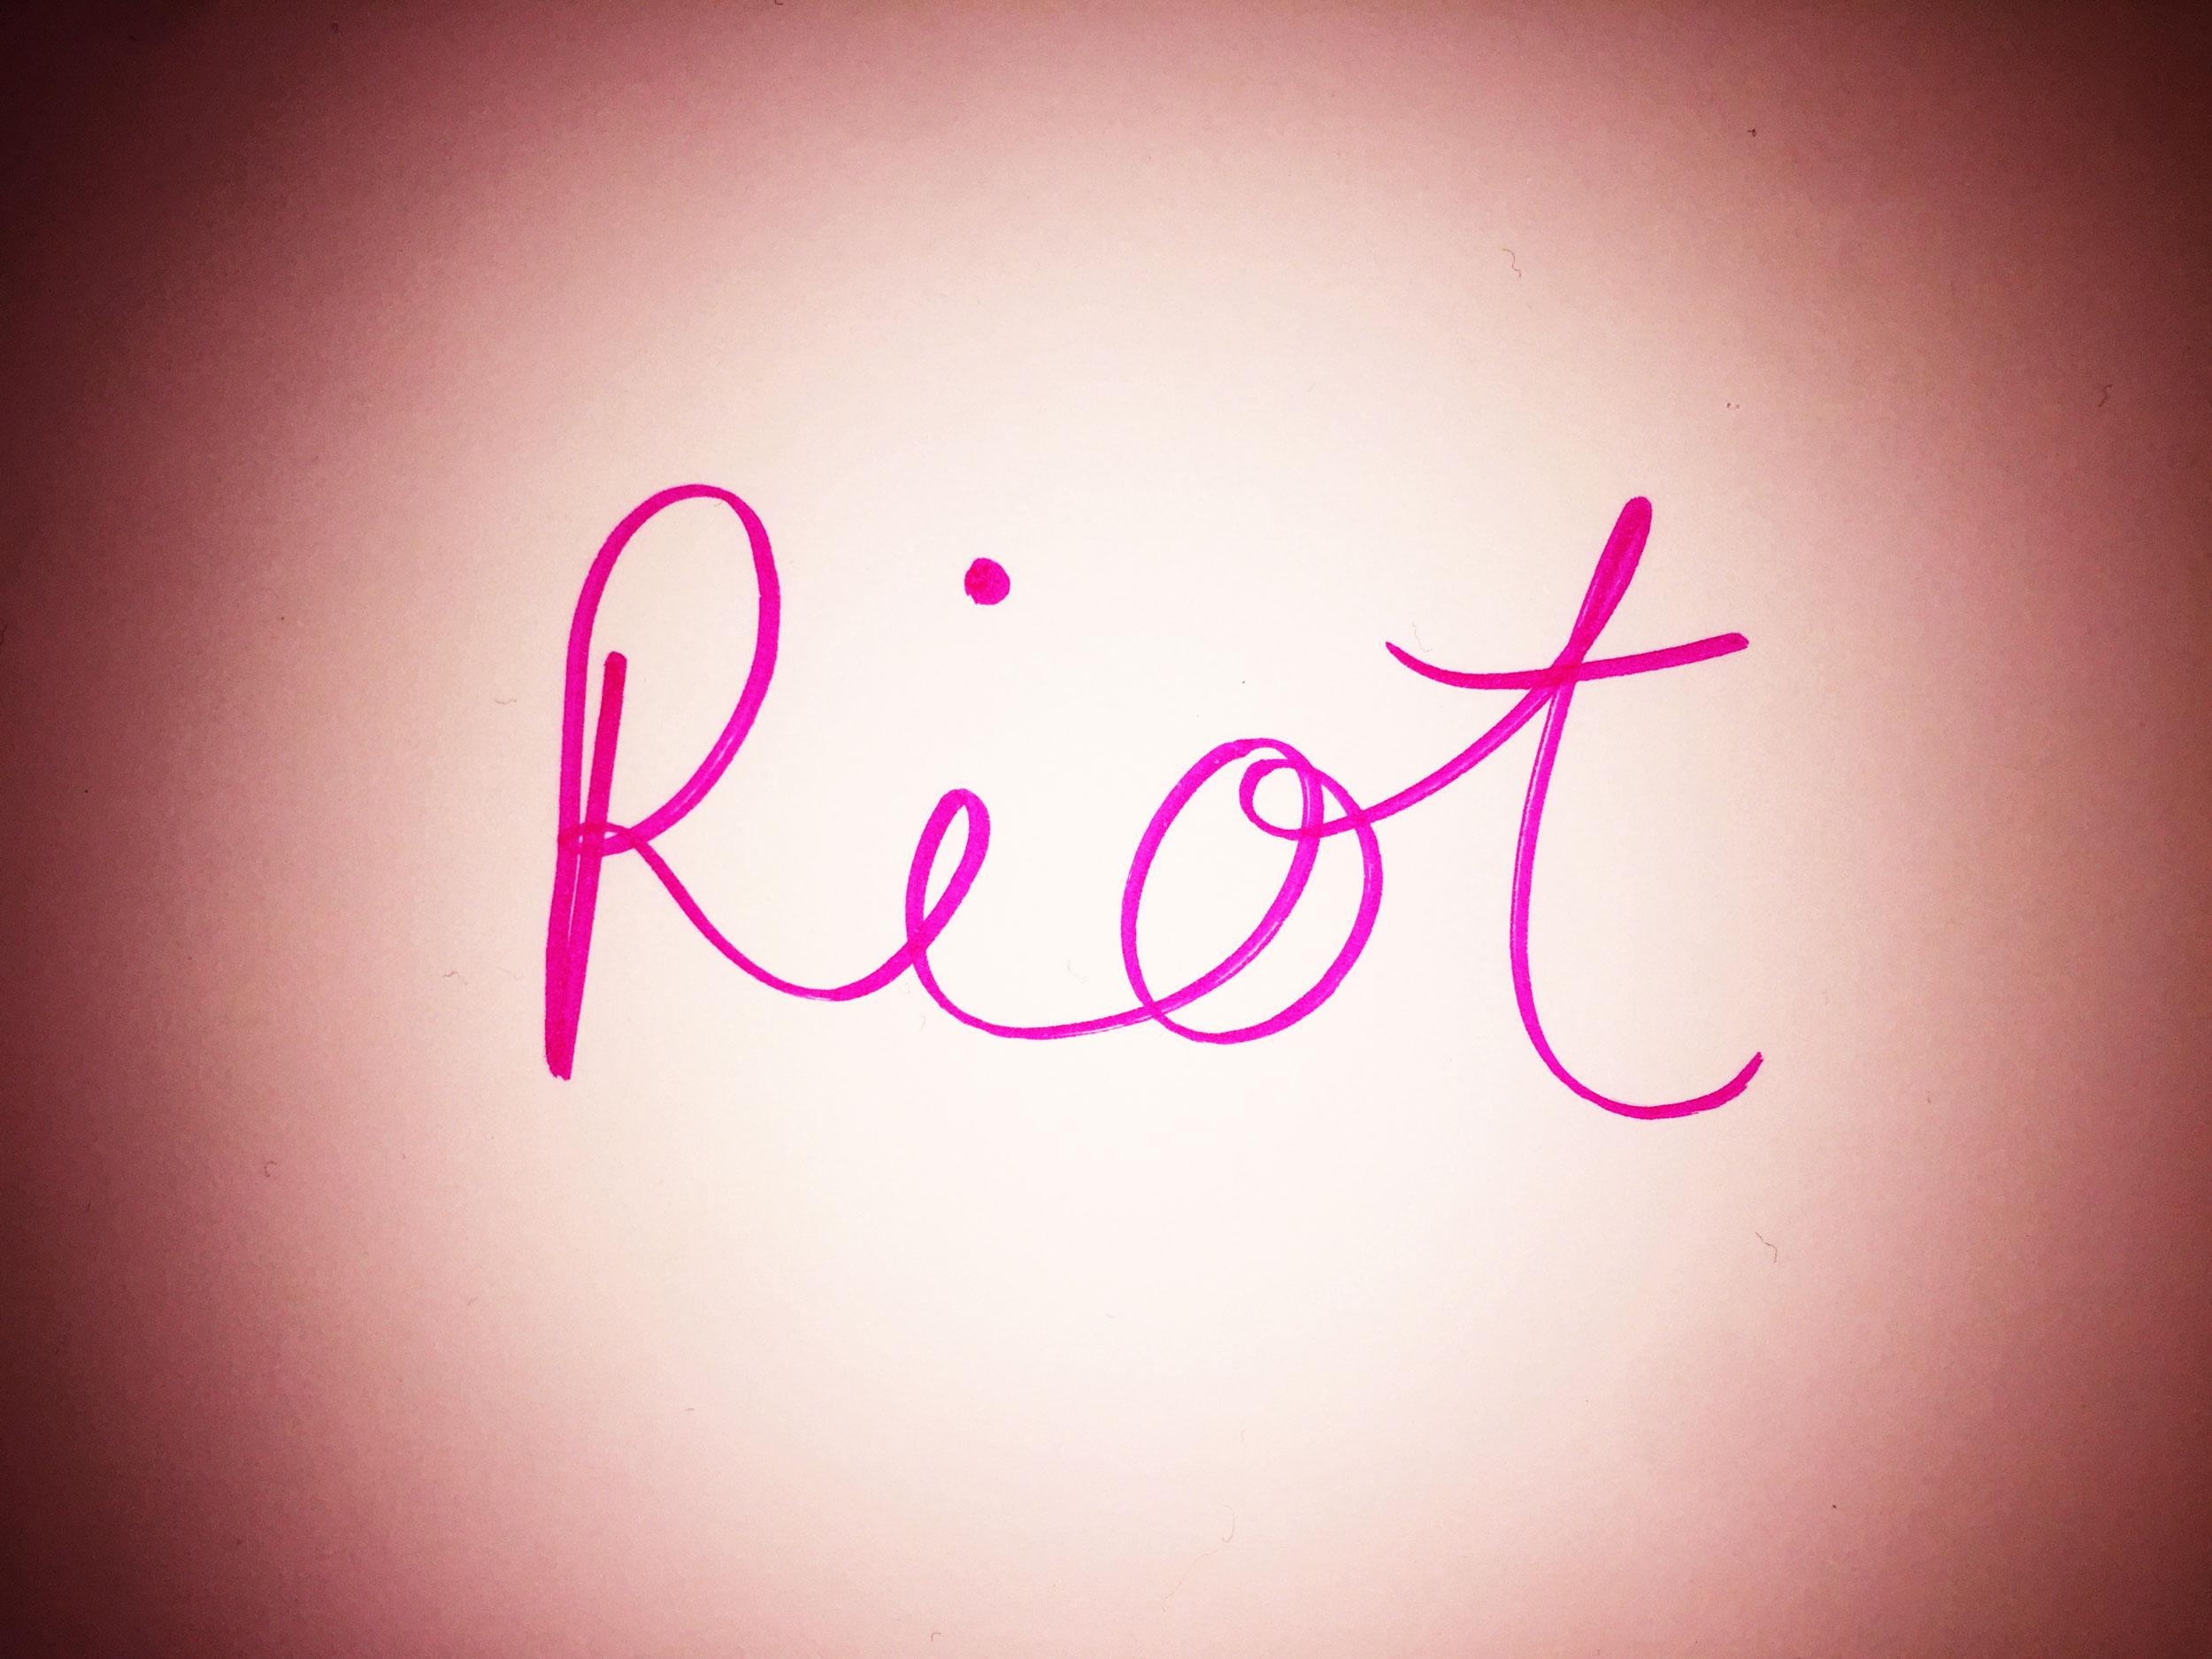 Riot. Drawing Luke Hockley.